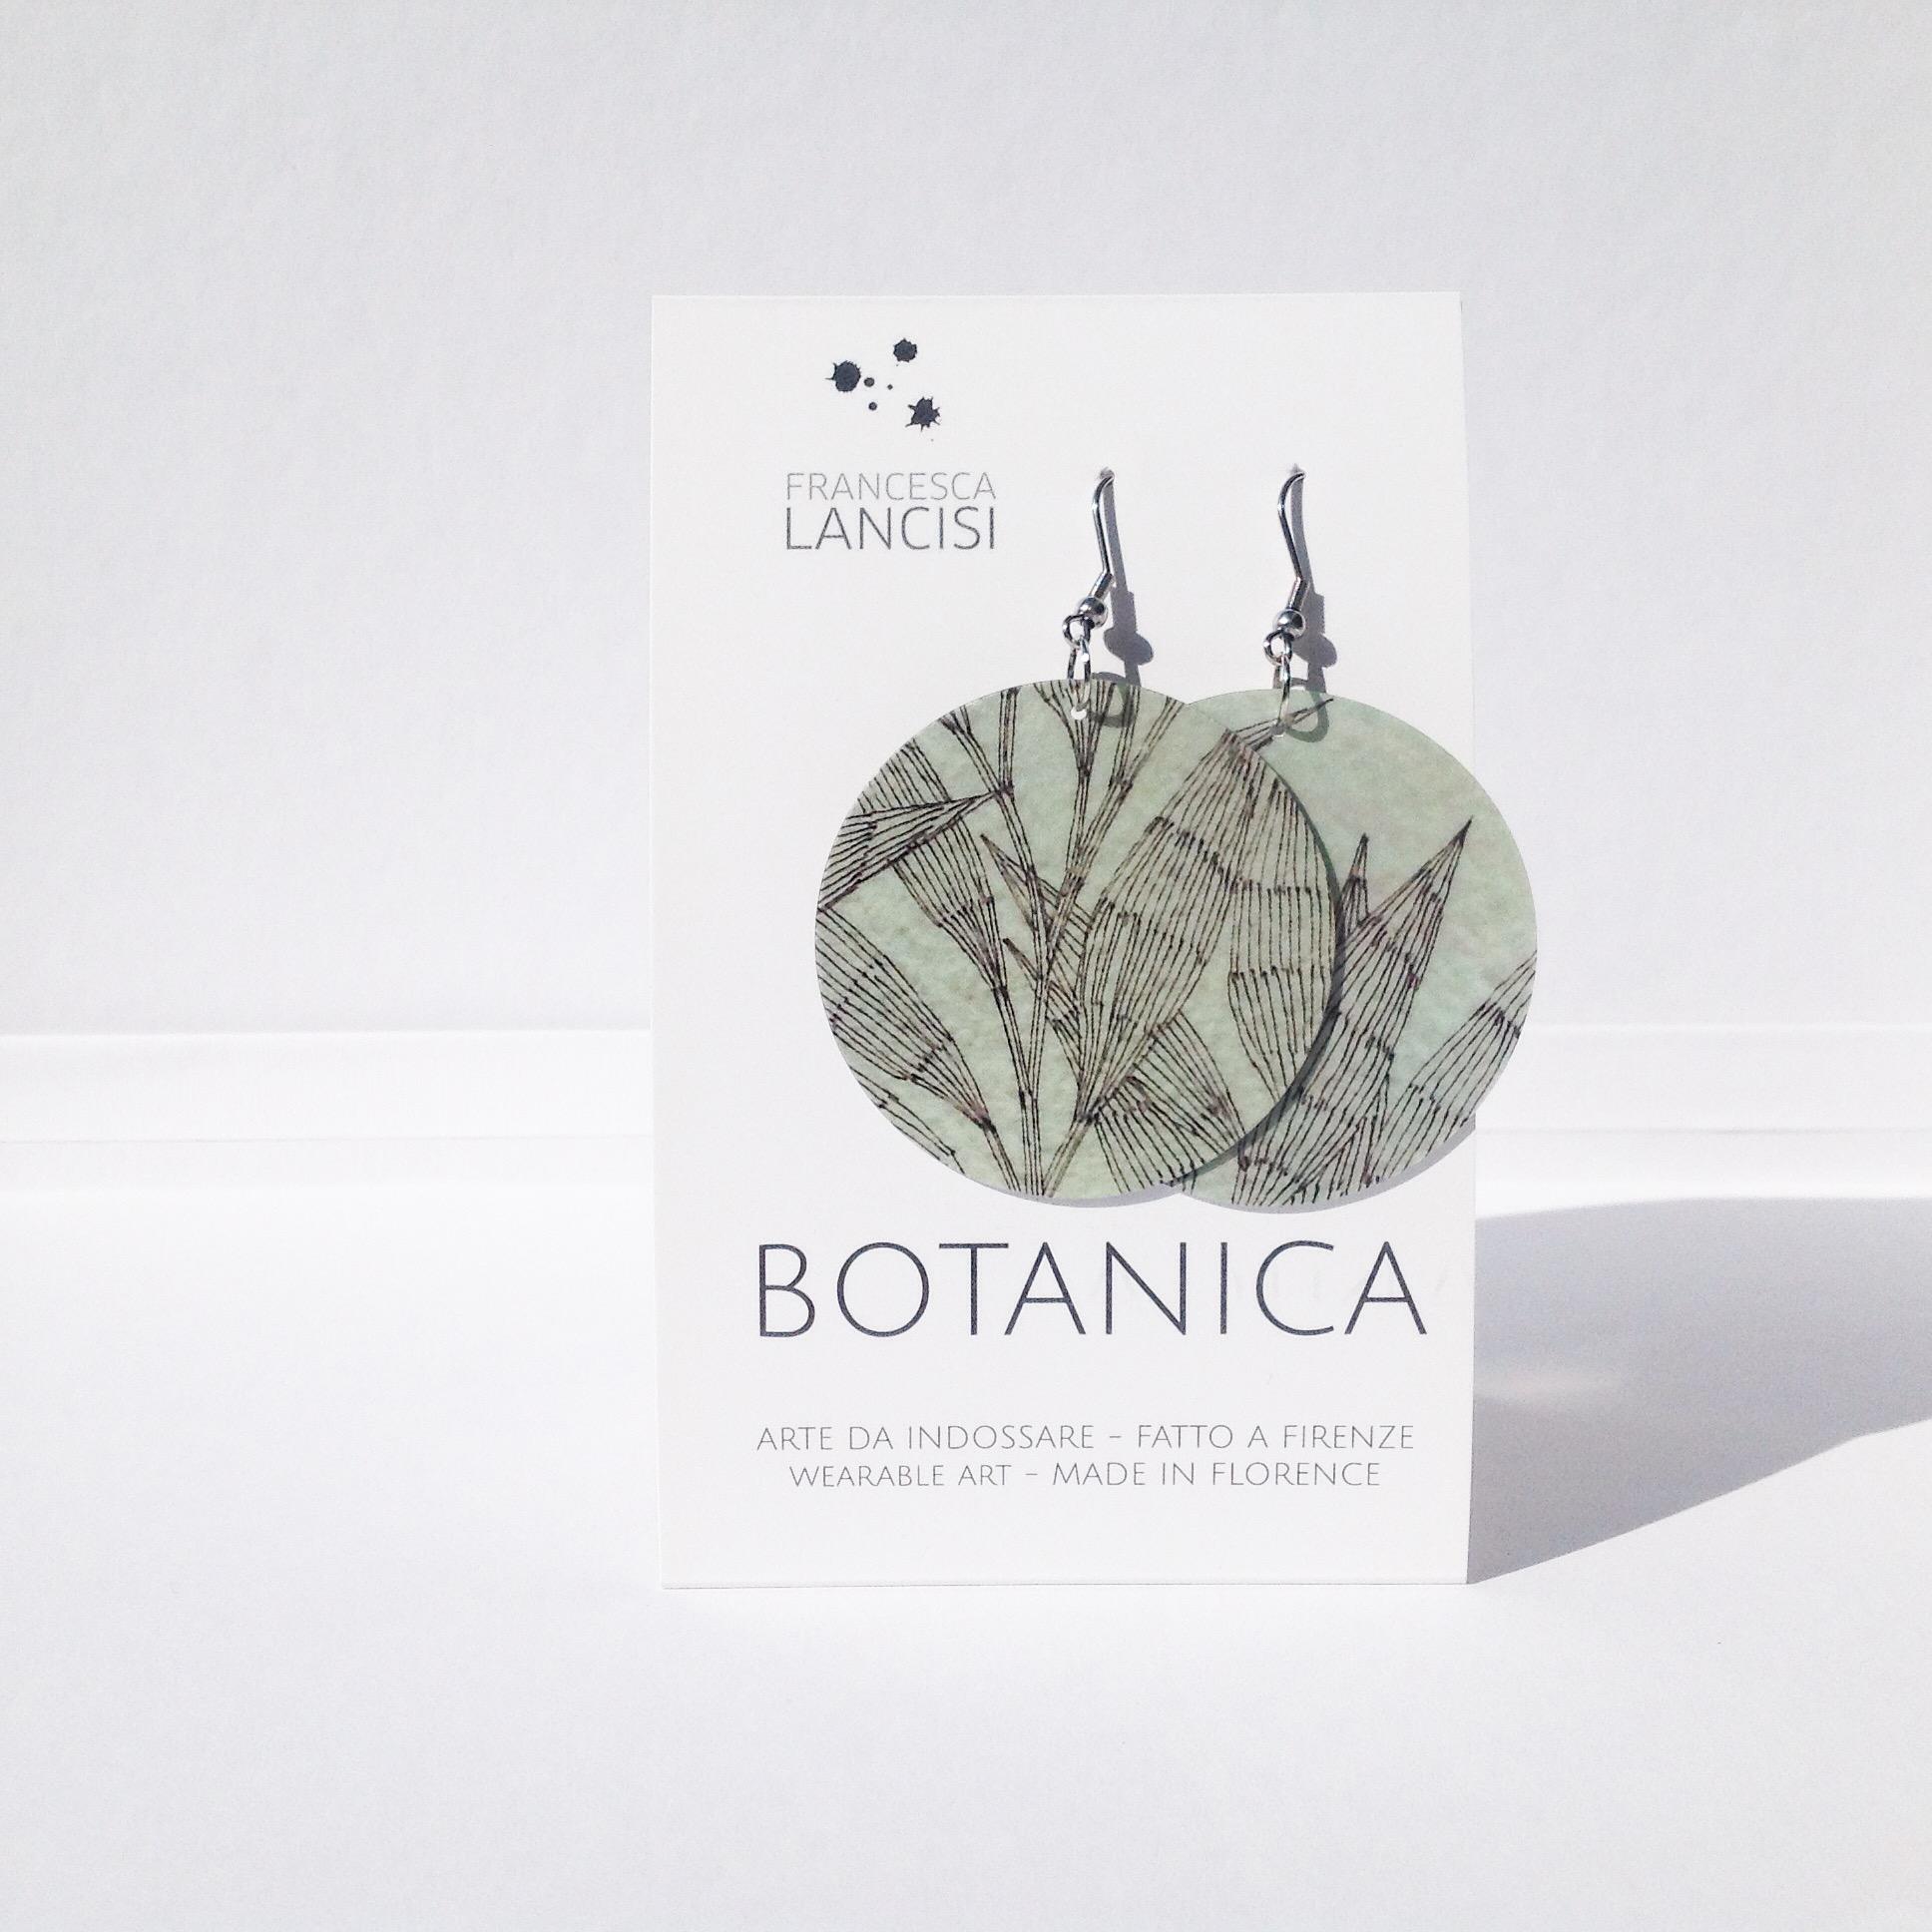 BOTANICA EARRINGS - ORECCHINI BOTANICA